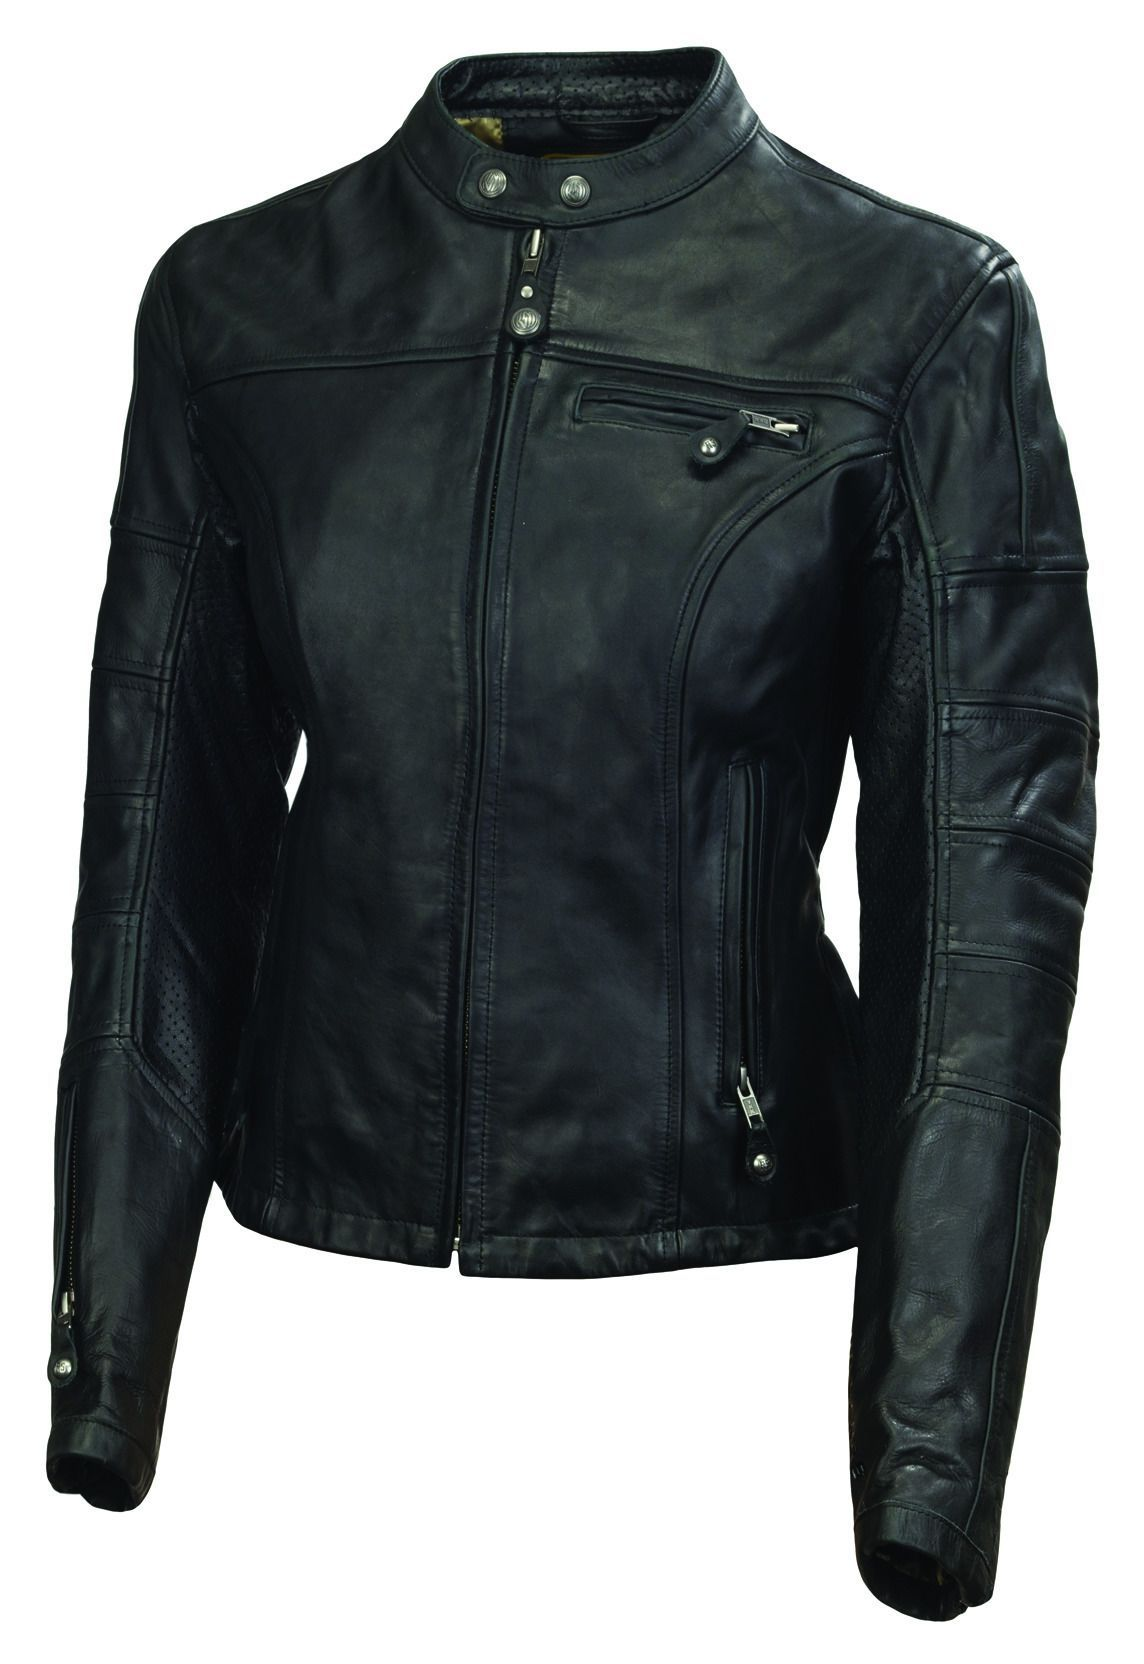 Roland Sands Maven Women S Leather Jacket Revzilla Leather Jackets Women Leather Jacket Leather Jacket Black [ 1664 x 1144 Pixel ]